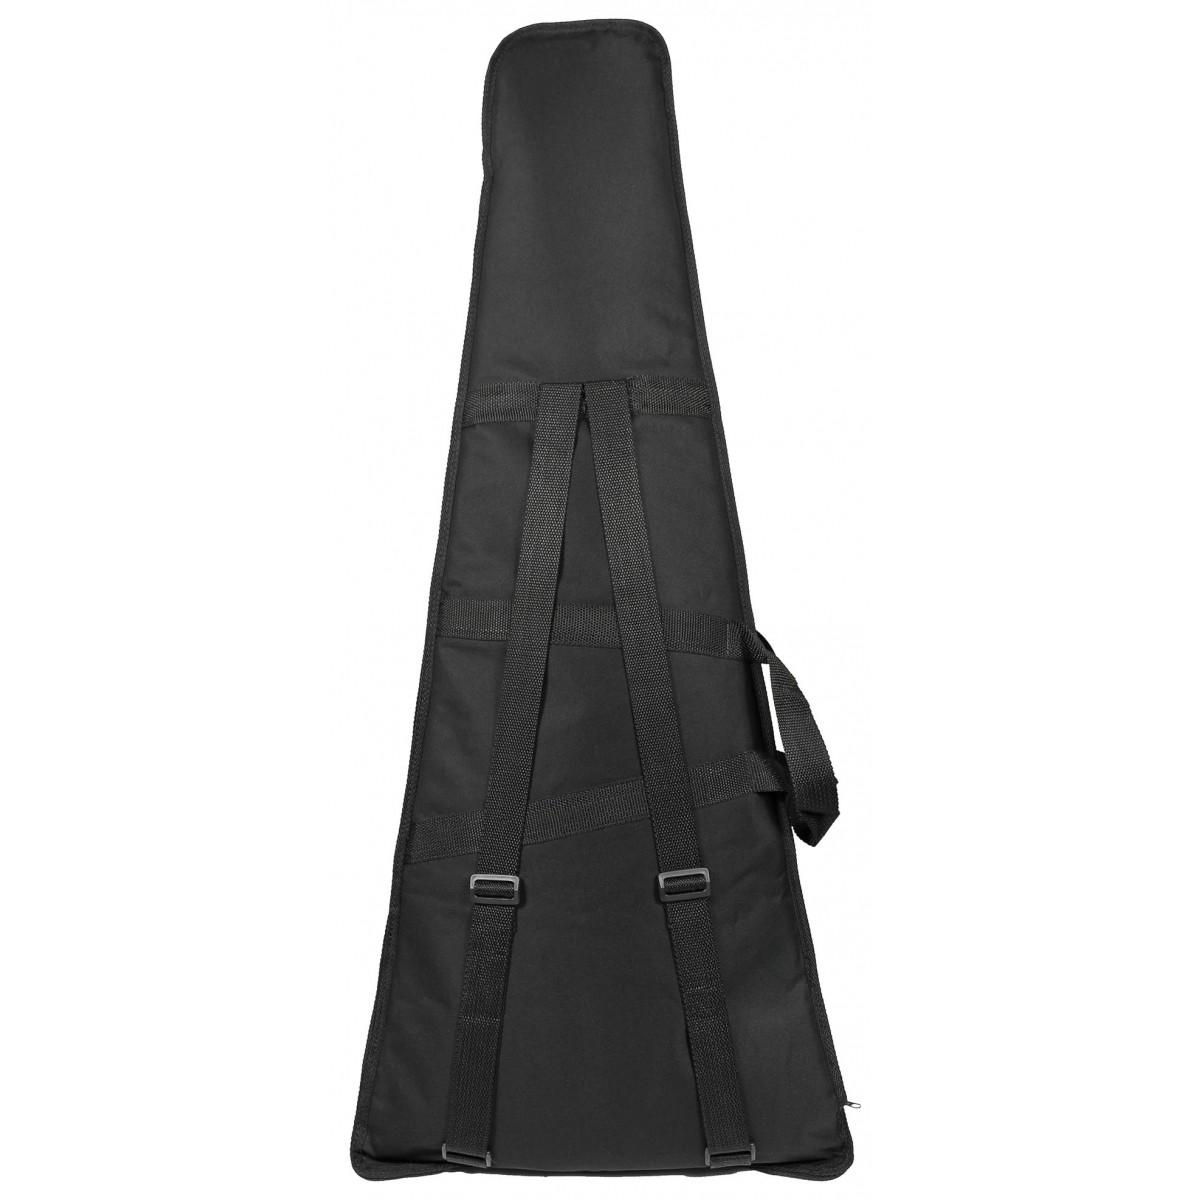 Capa Guitarra Soft Case Start Almofadada - Preto